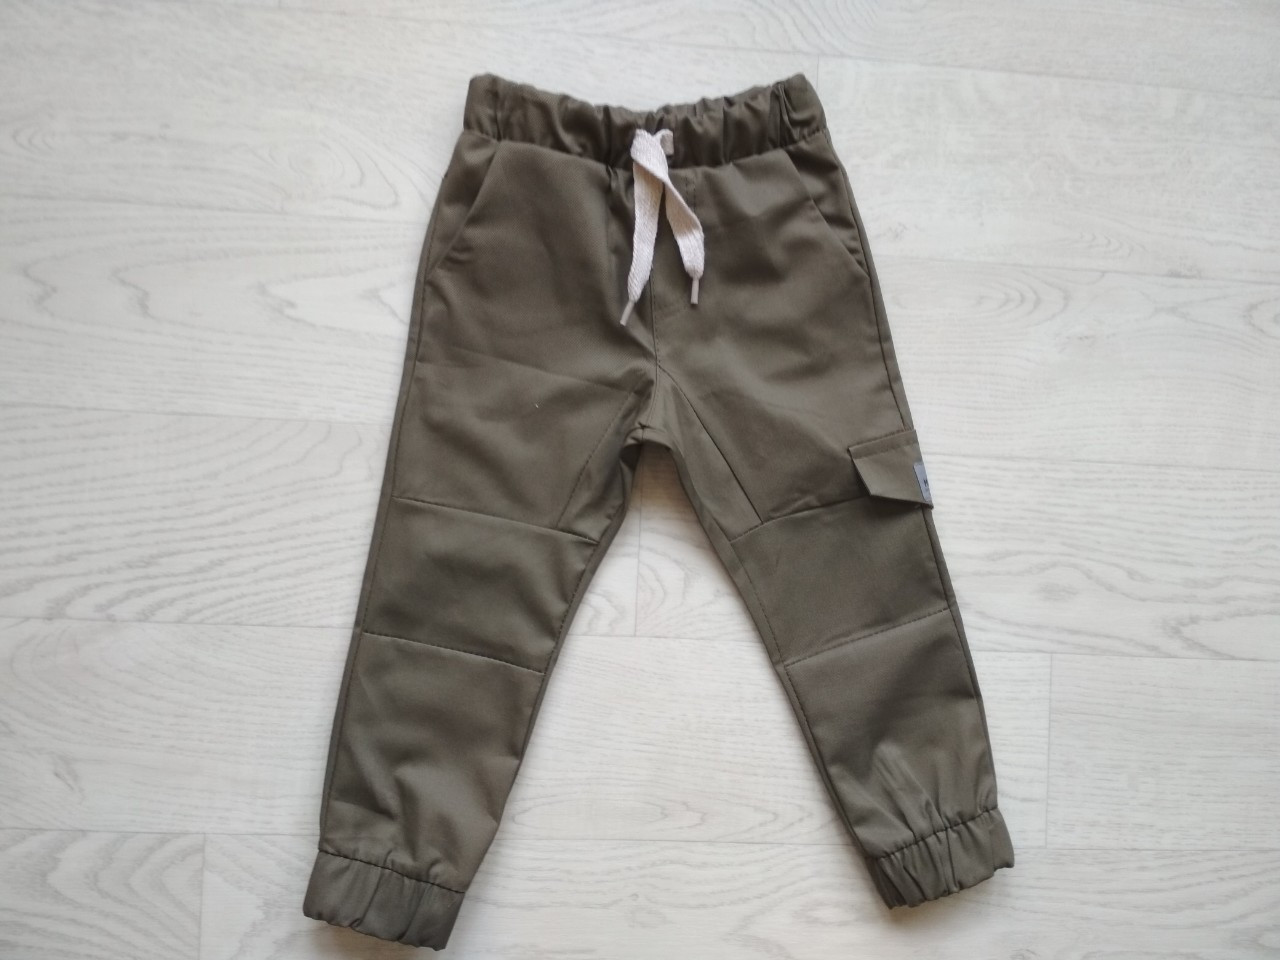 Штаны-джогеры для мальчика Коттон Хаки  р. 92 (54 см)